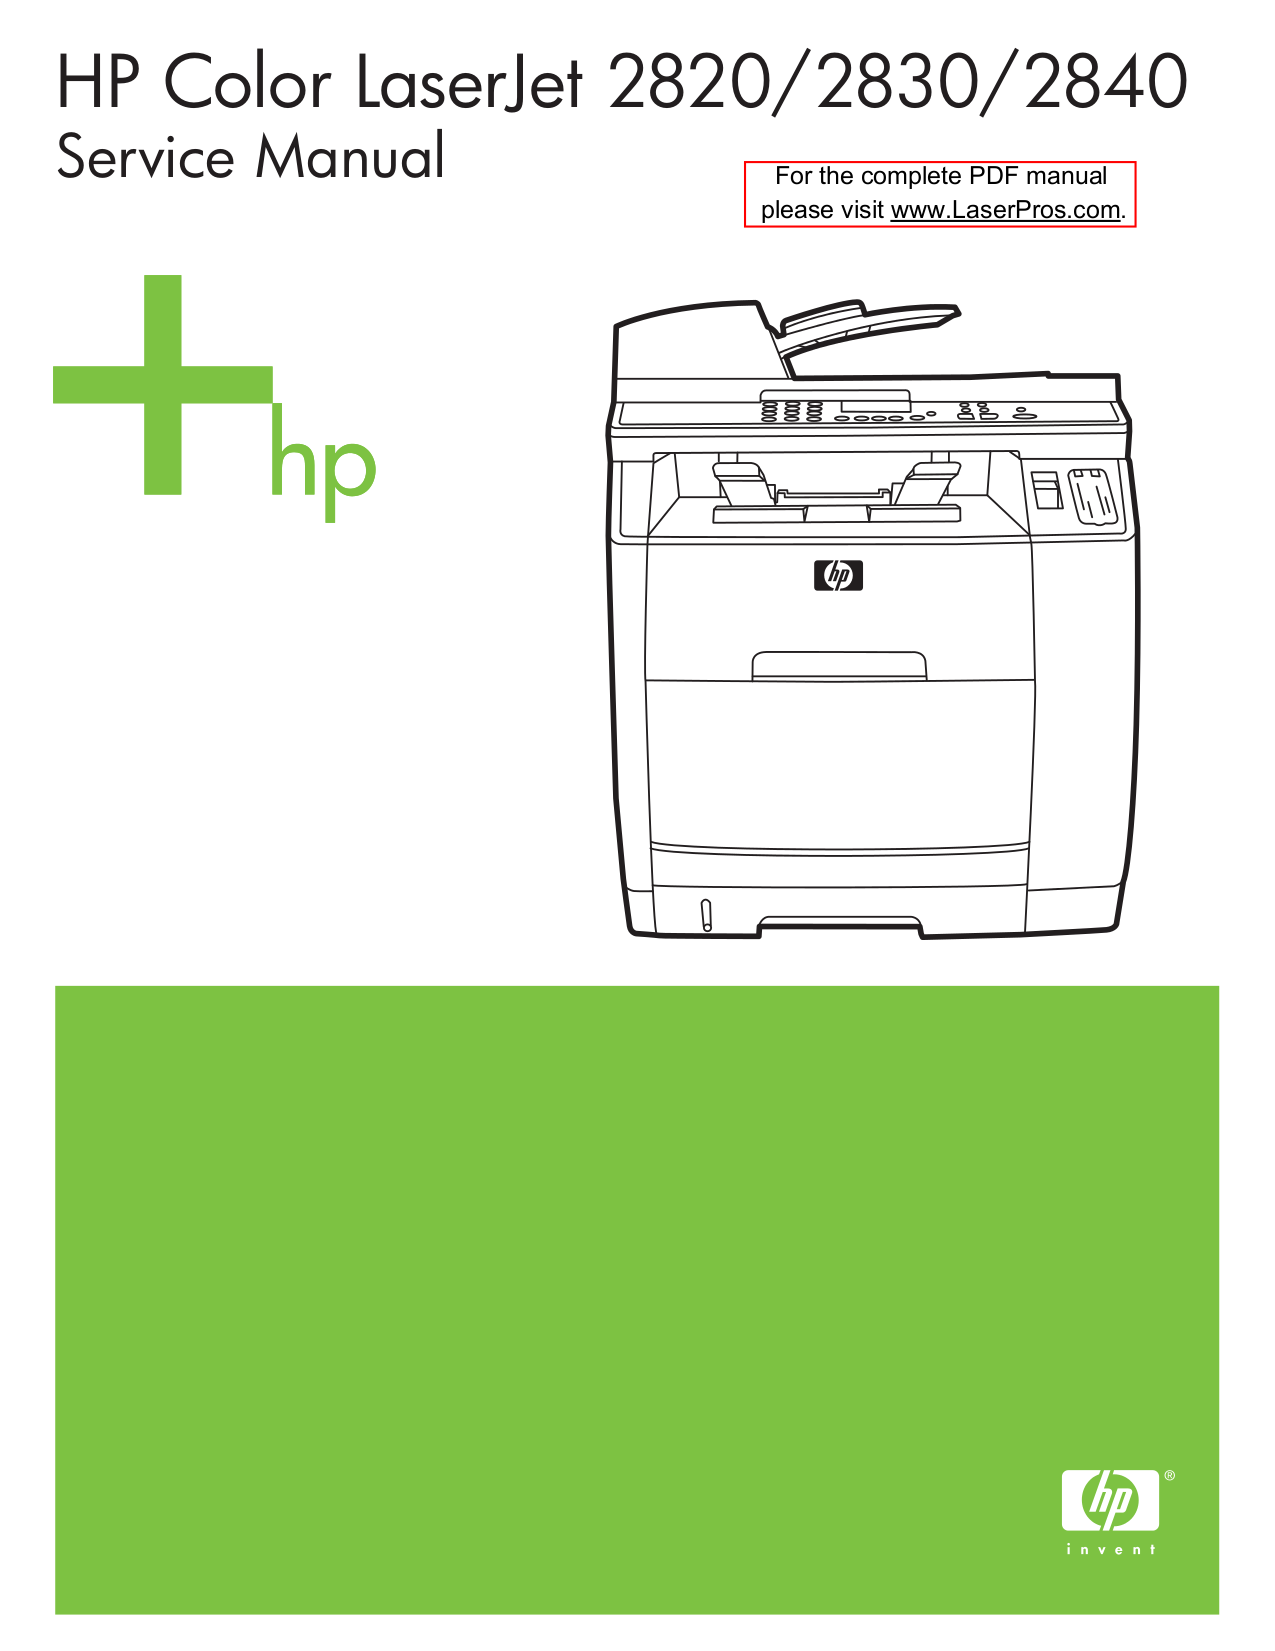 pdf for HP Multifunction Printer Laserjet,Color Laserjet 2820 manual